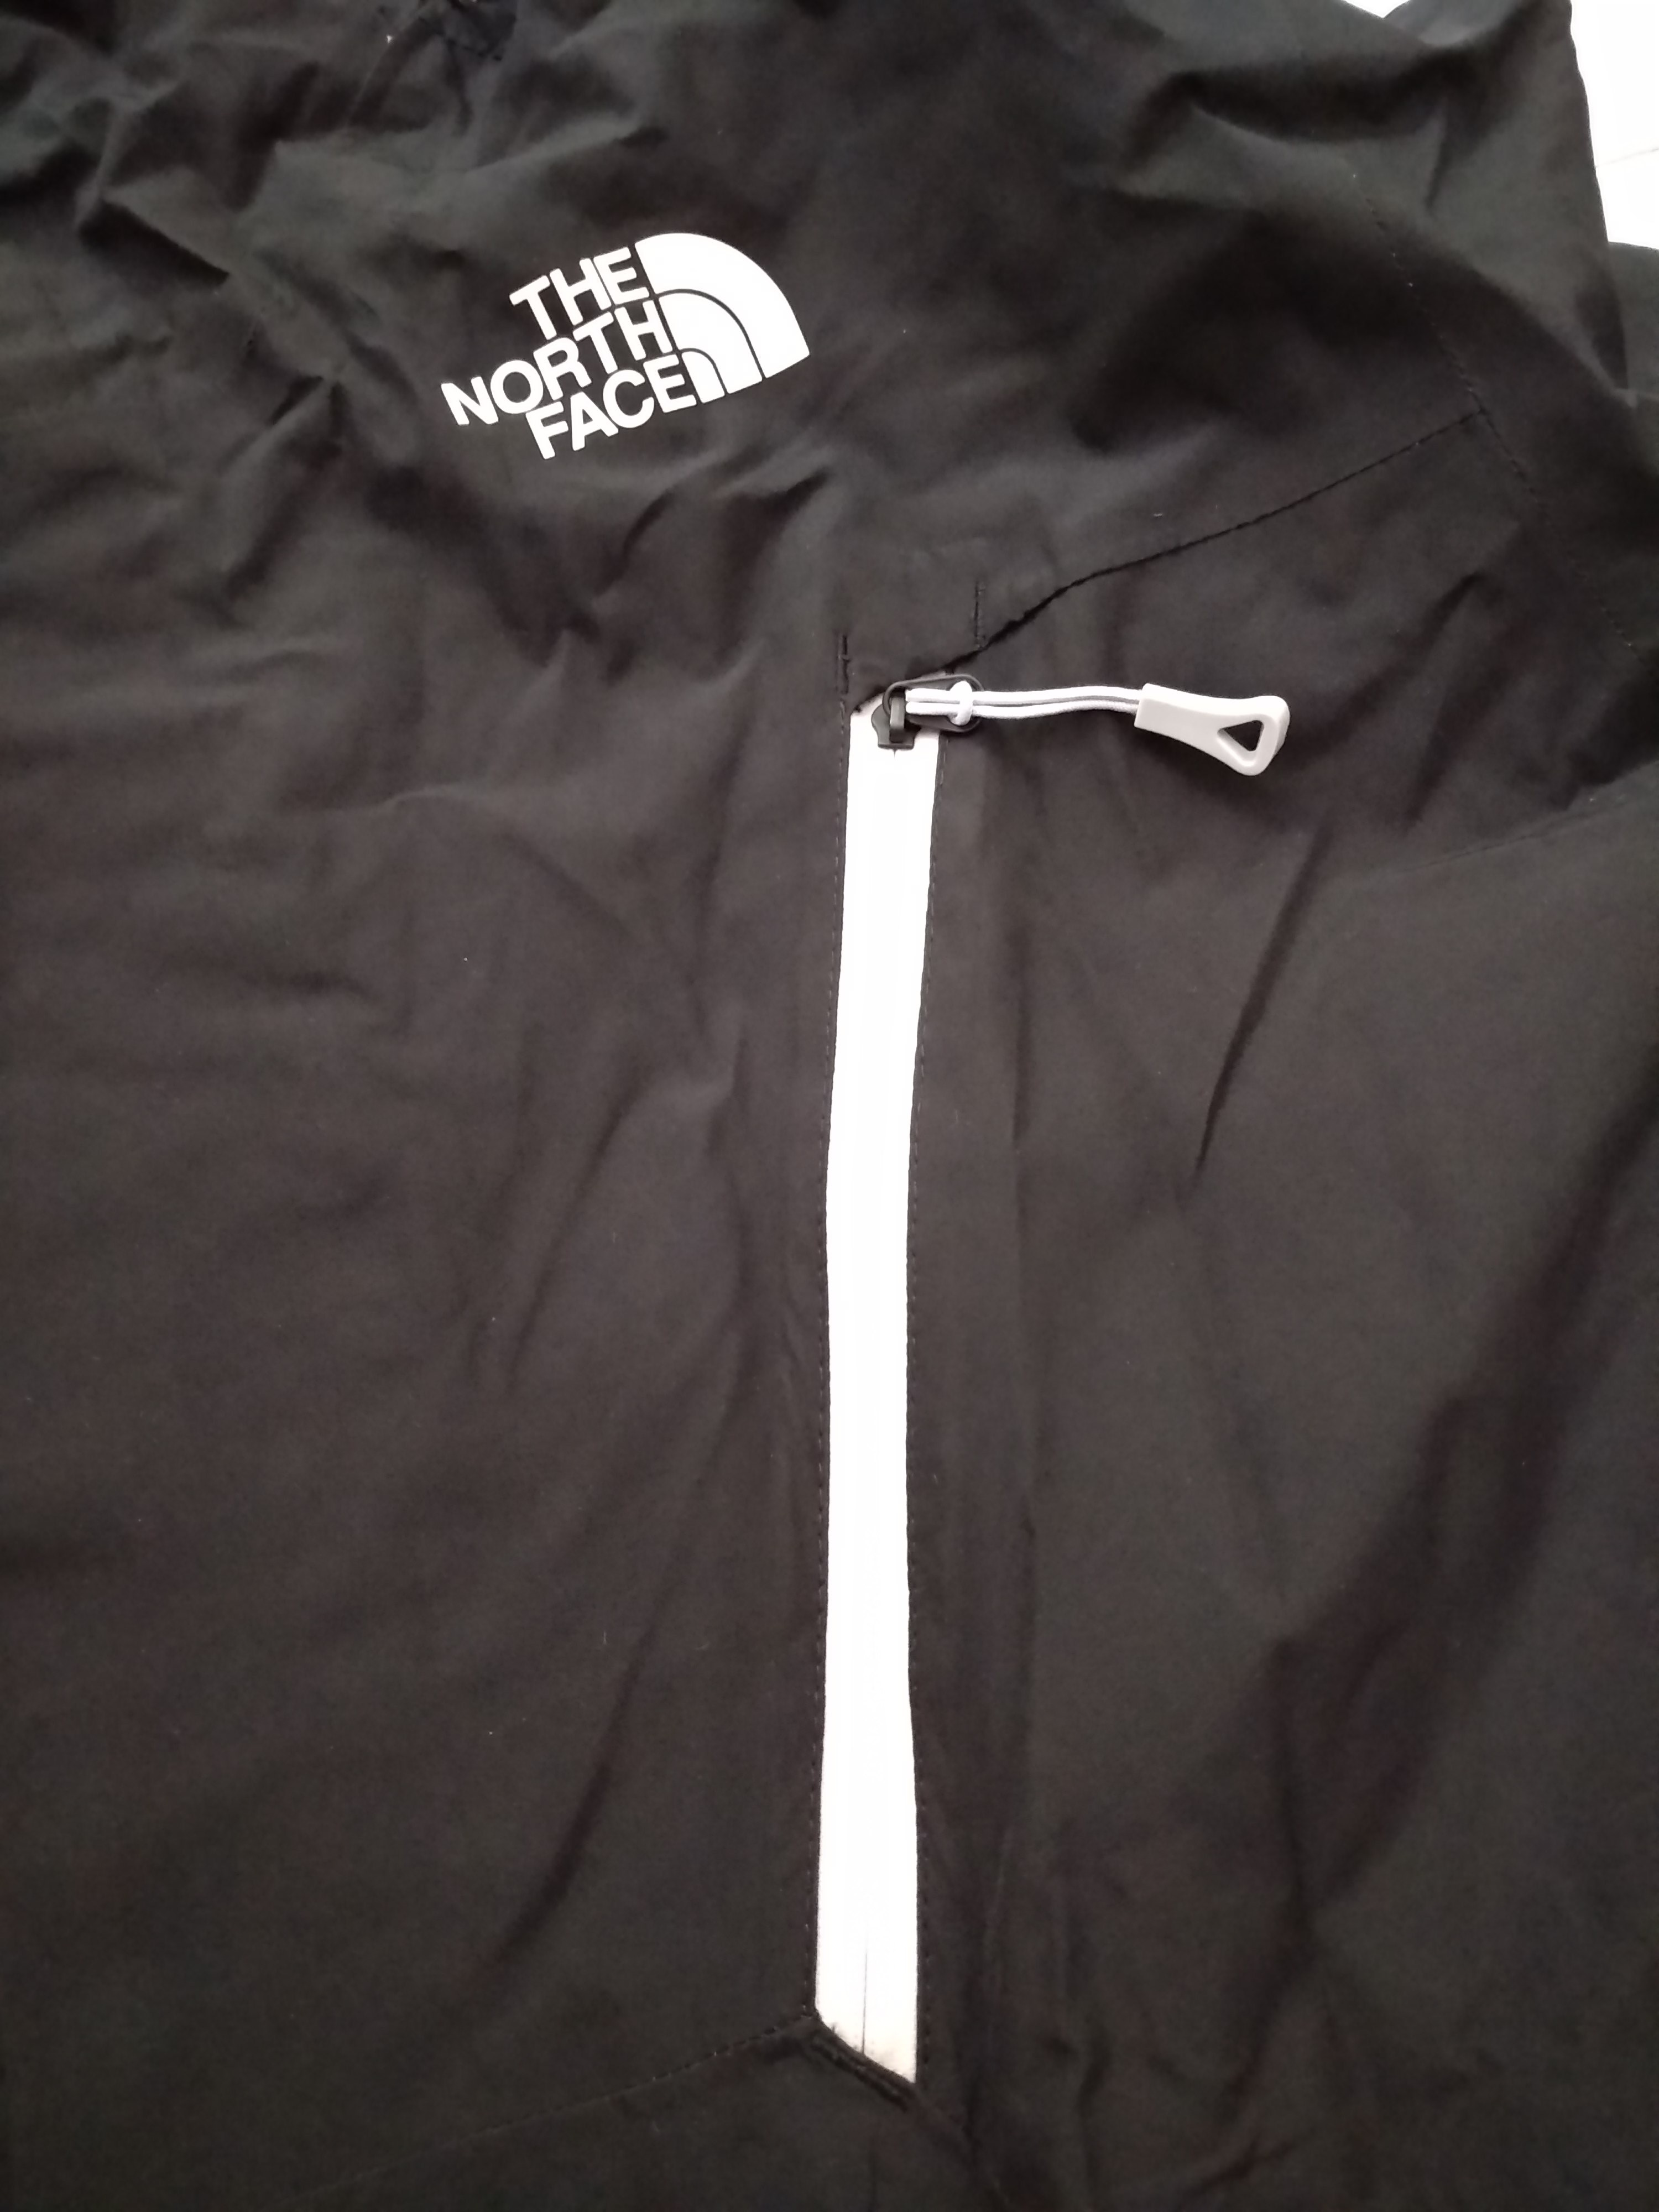 bb4ccb9b676cc NorthFace Men Winter Ski jacket. Heatseeker. DryVent., Men's Fashion ...